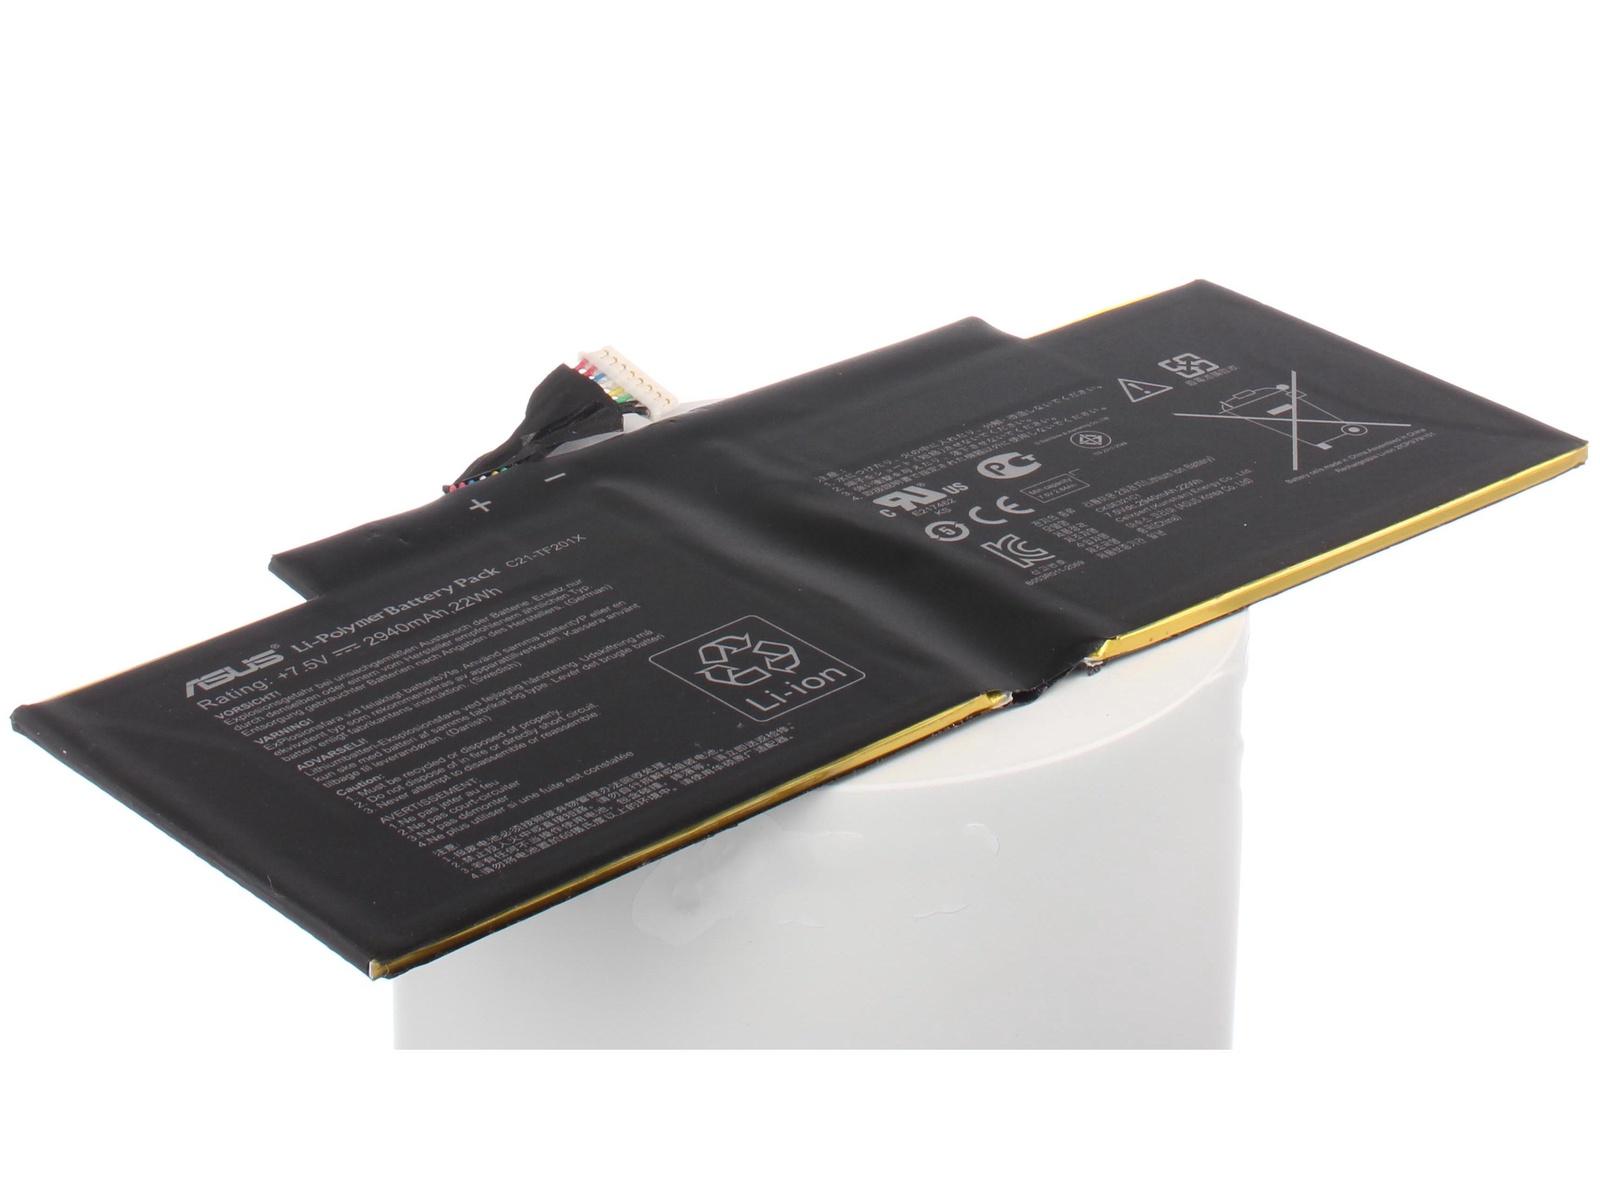 Аккумуляторная батарея iBatt iB-T1-A691 2900mAh для ноутбуков Asus цена